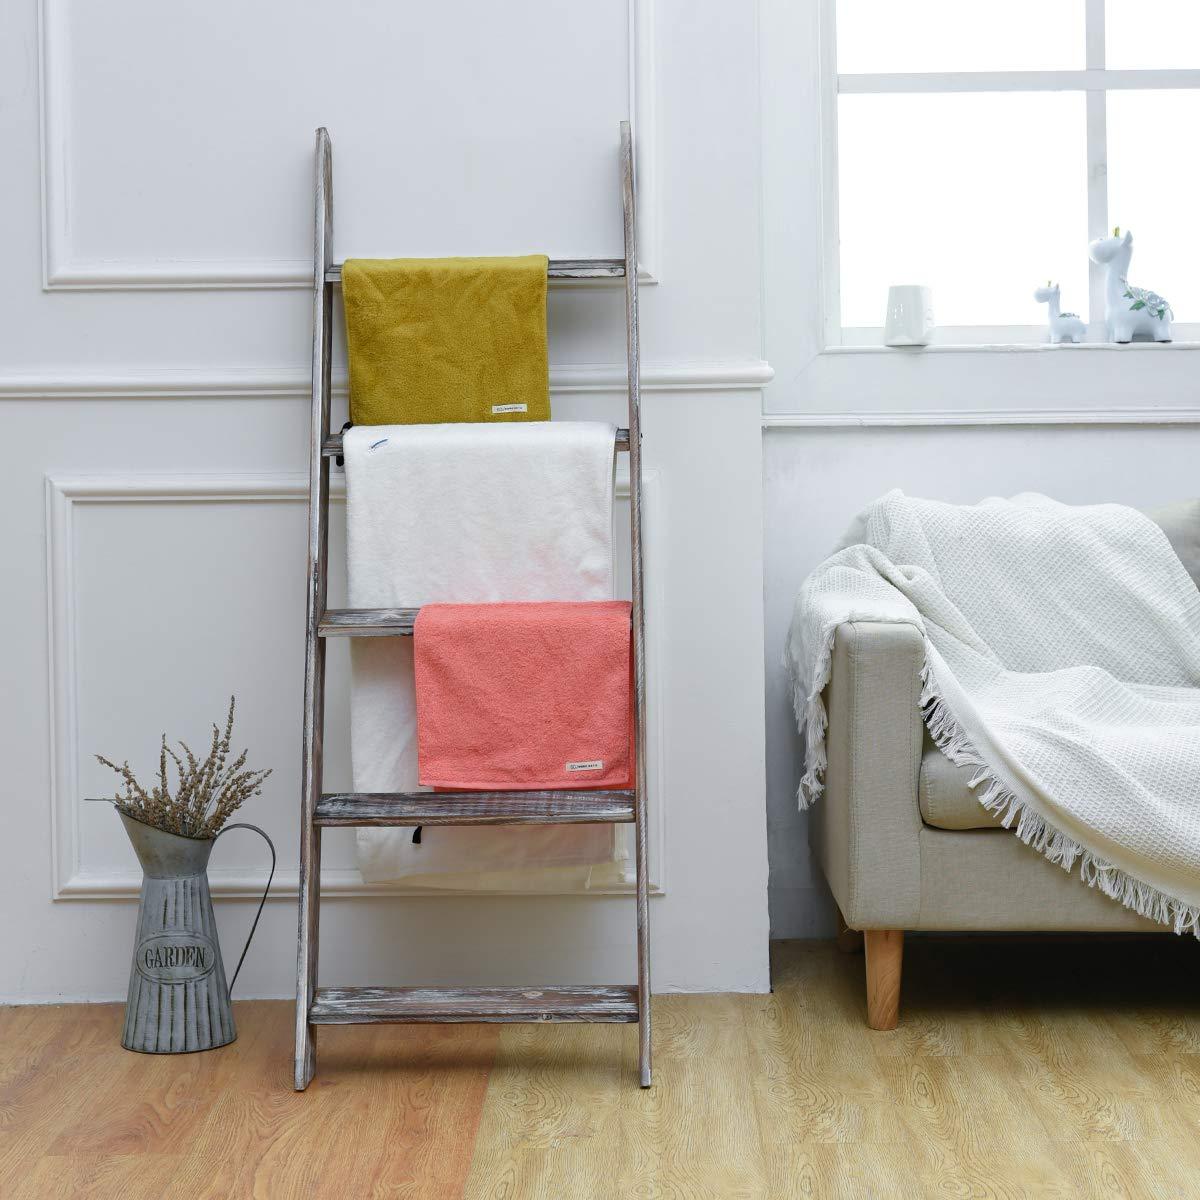 official photos 32e71 648c3 Gorgeous Rustic Wood Blanket Ladder, 4.5 Feet Tall, Decorative Shelf  Ladder, Hanging Towel Bar Rack, Leaning Shelf, Blanket Rack, Decorative  Ladder ...